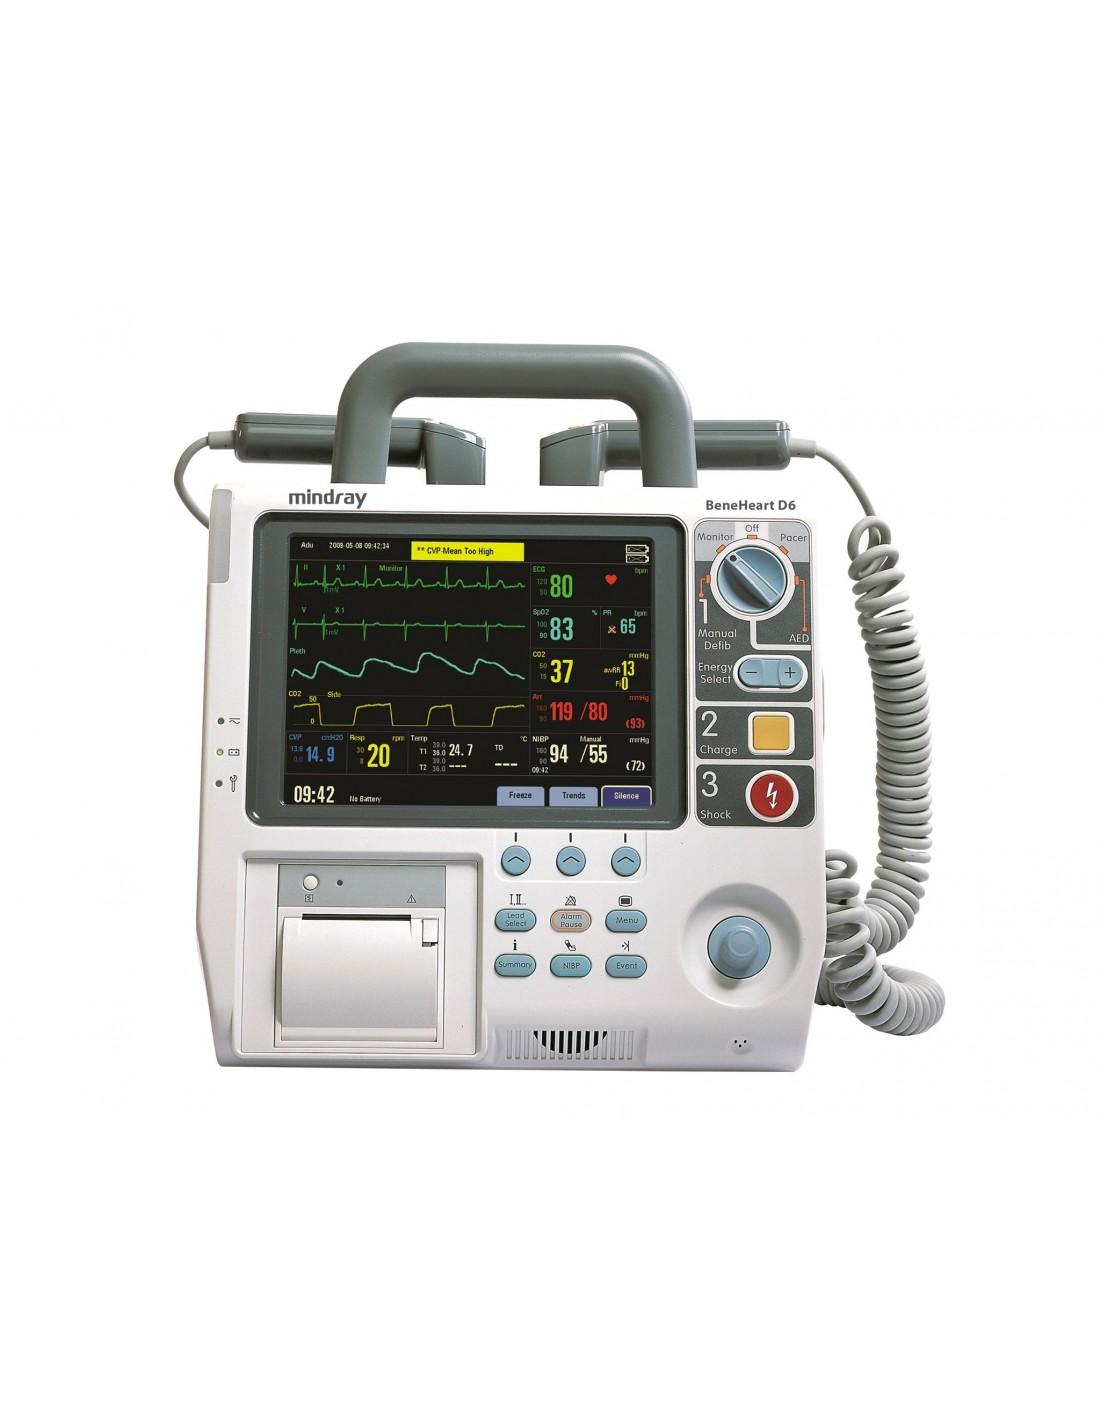 Defibrilator / Monitor Mindray Beneheart D6